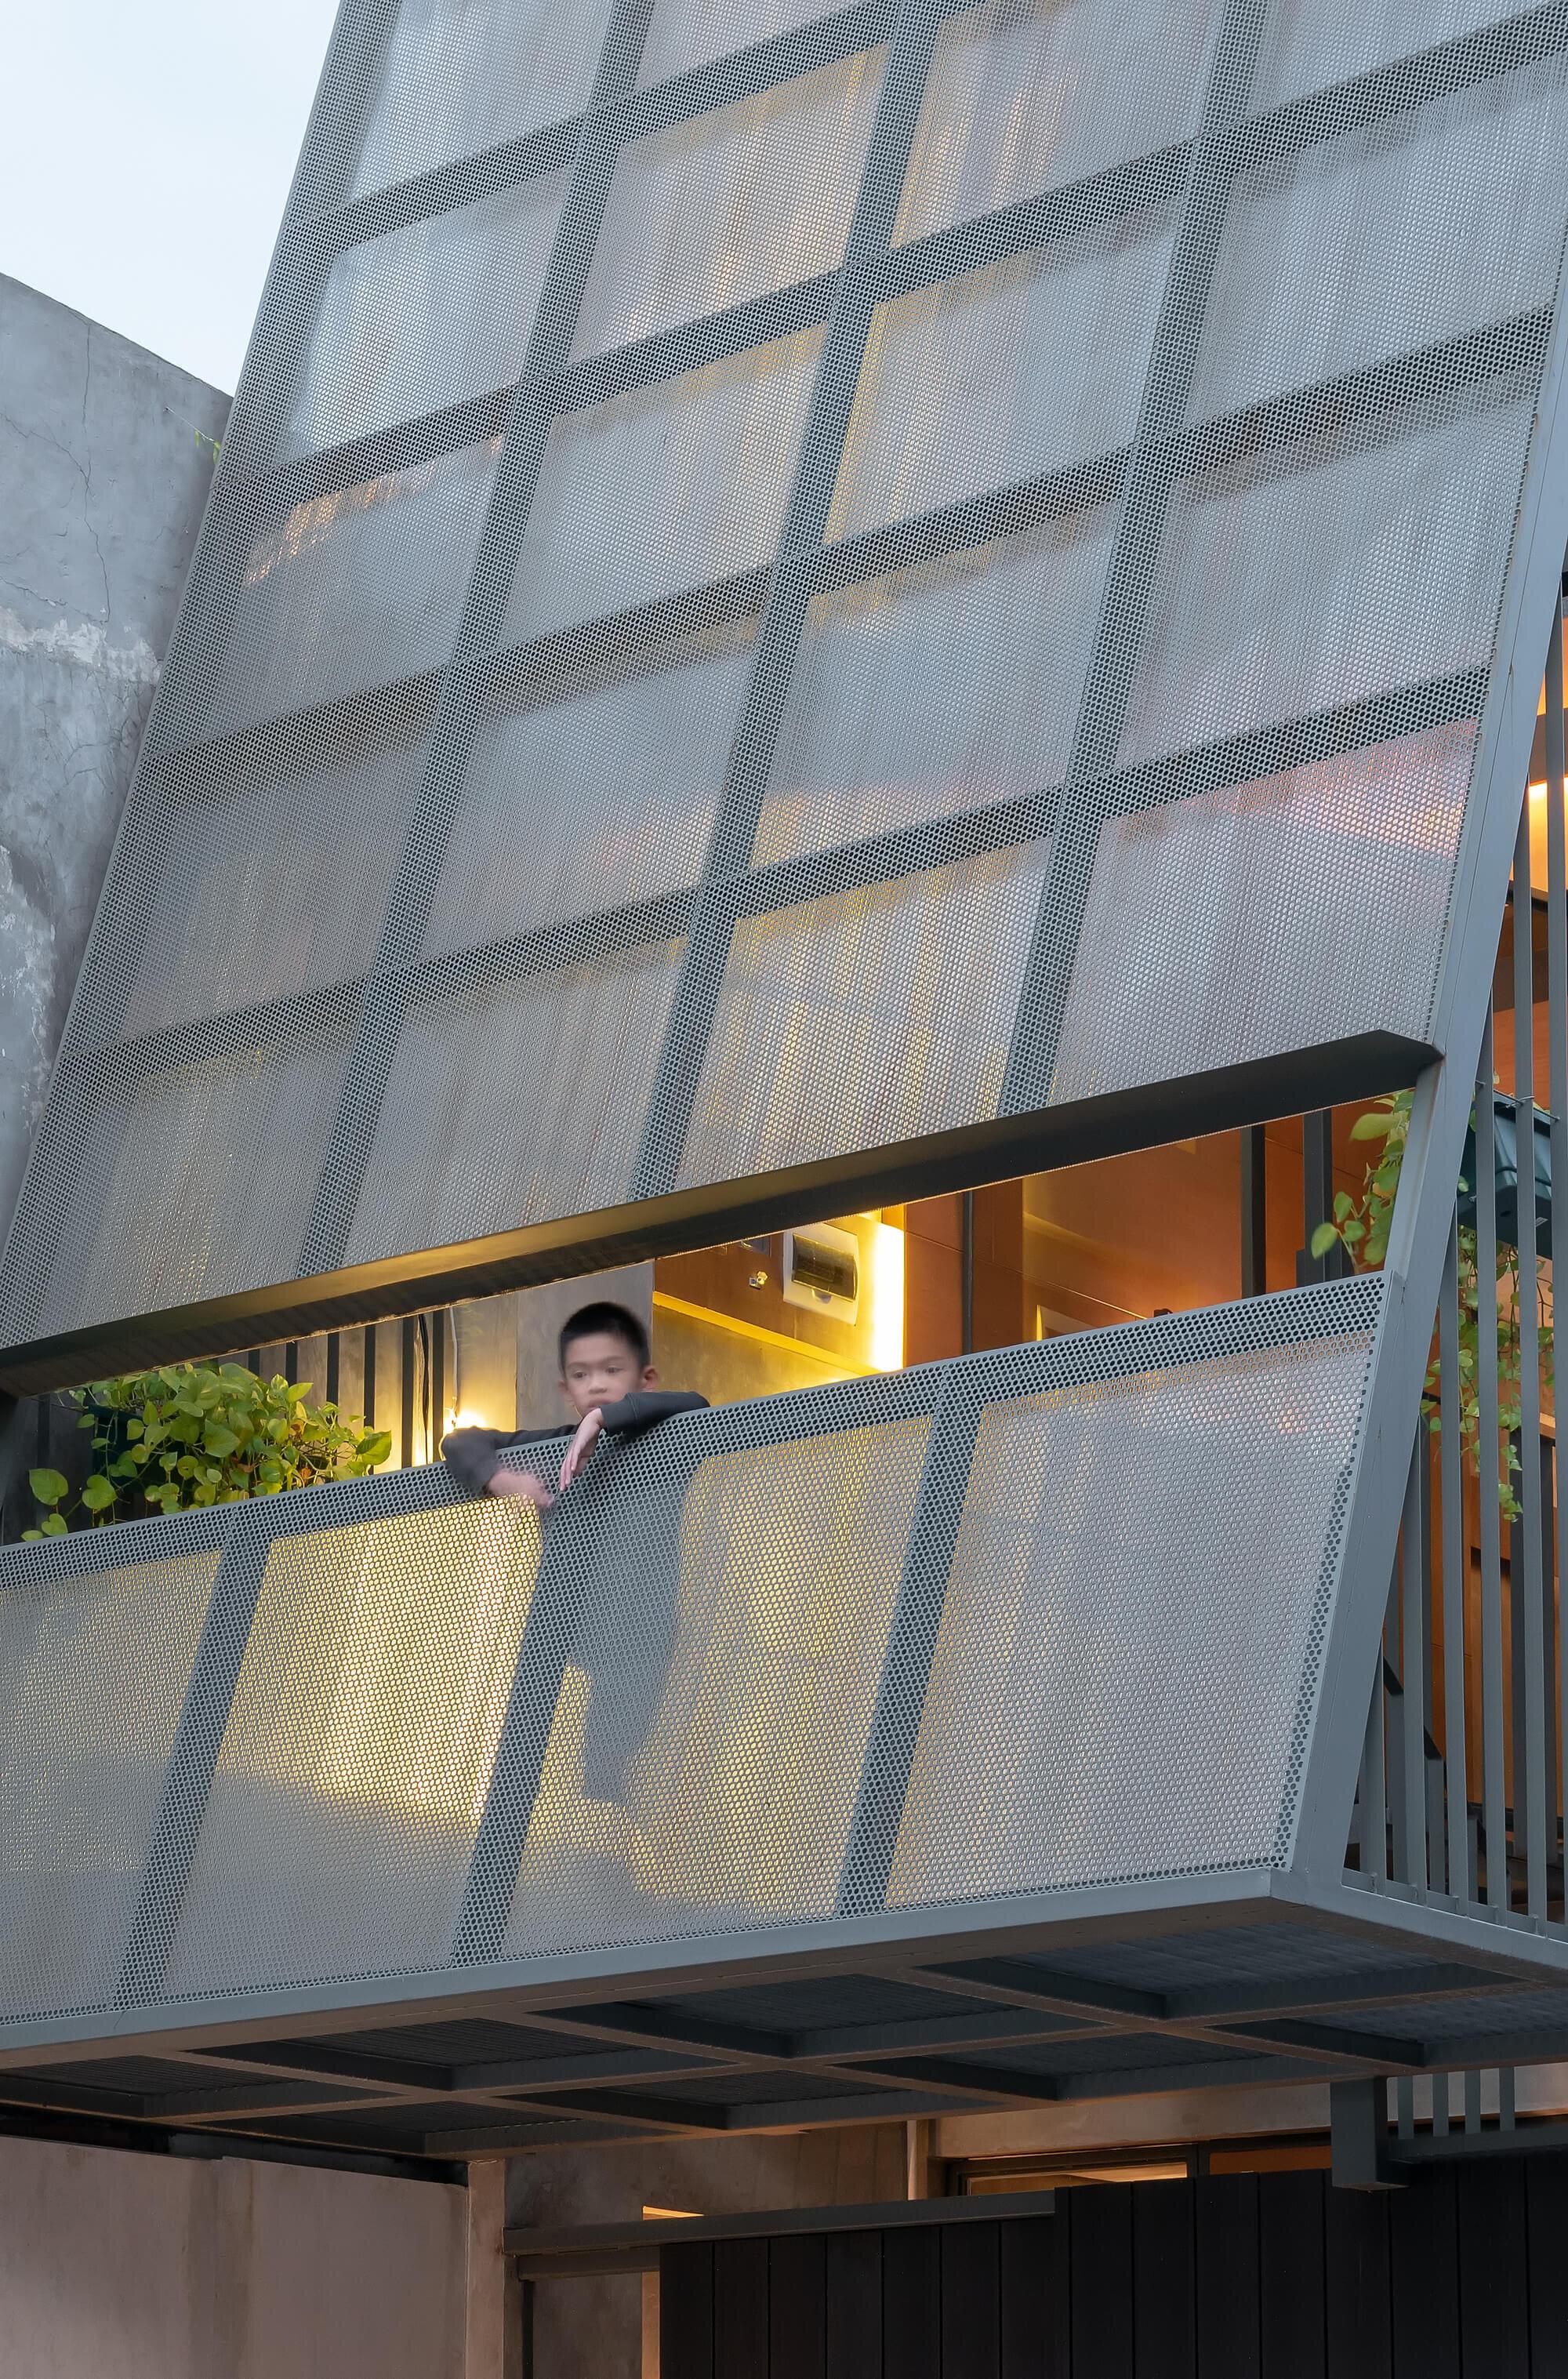 3500-Millimetre-House-Ago-Architects-Indonesia-1